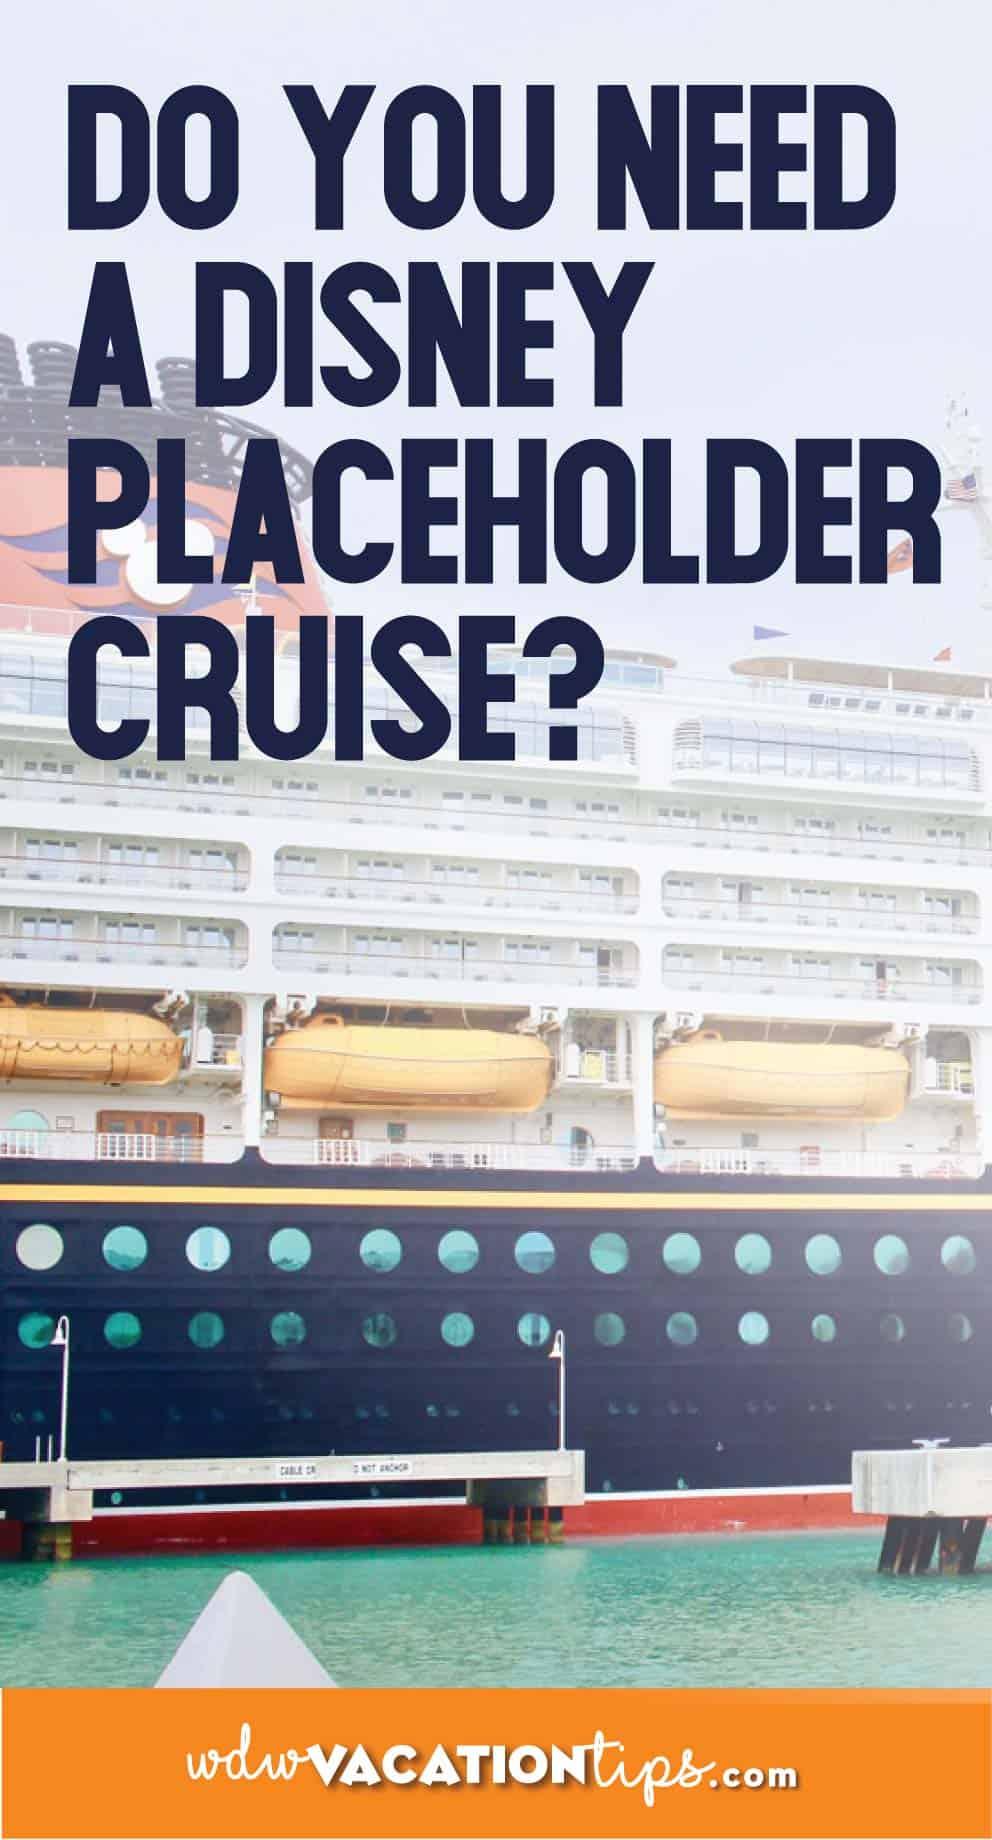 Disney Cruise Placeholder